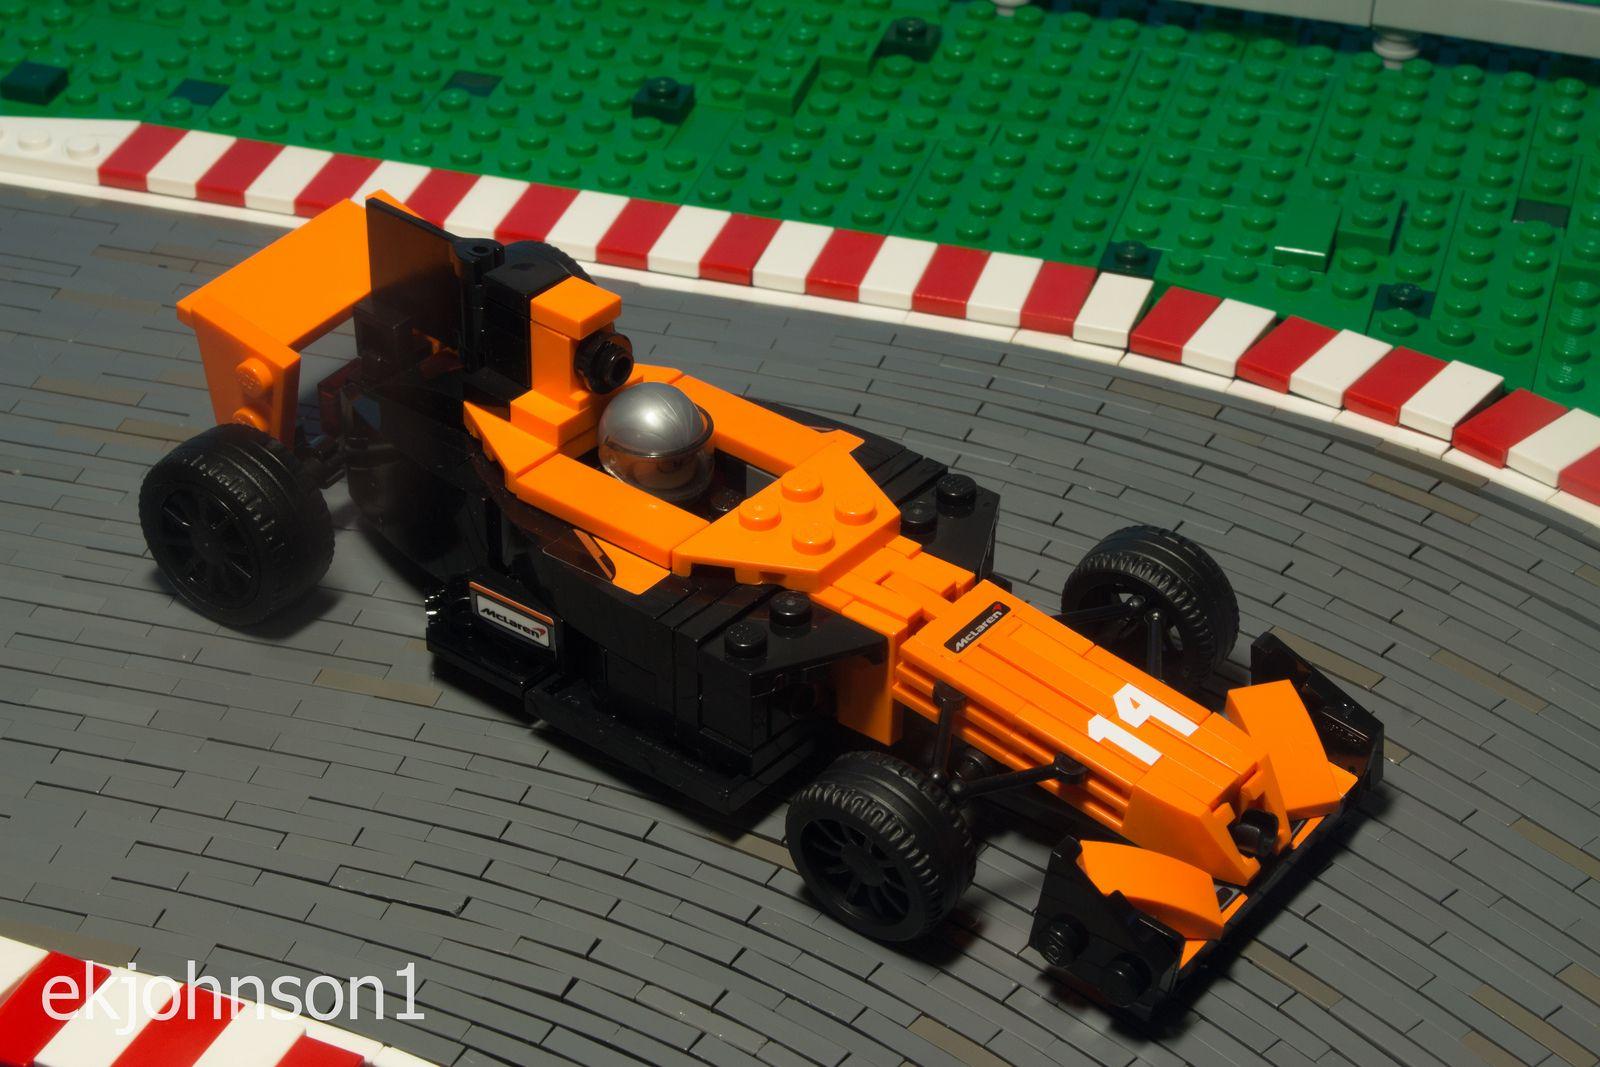 Fernando Alonso 2017 McLaren Honda MCL32 | by ekjohnson1